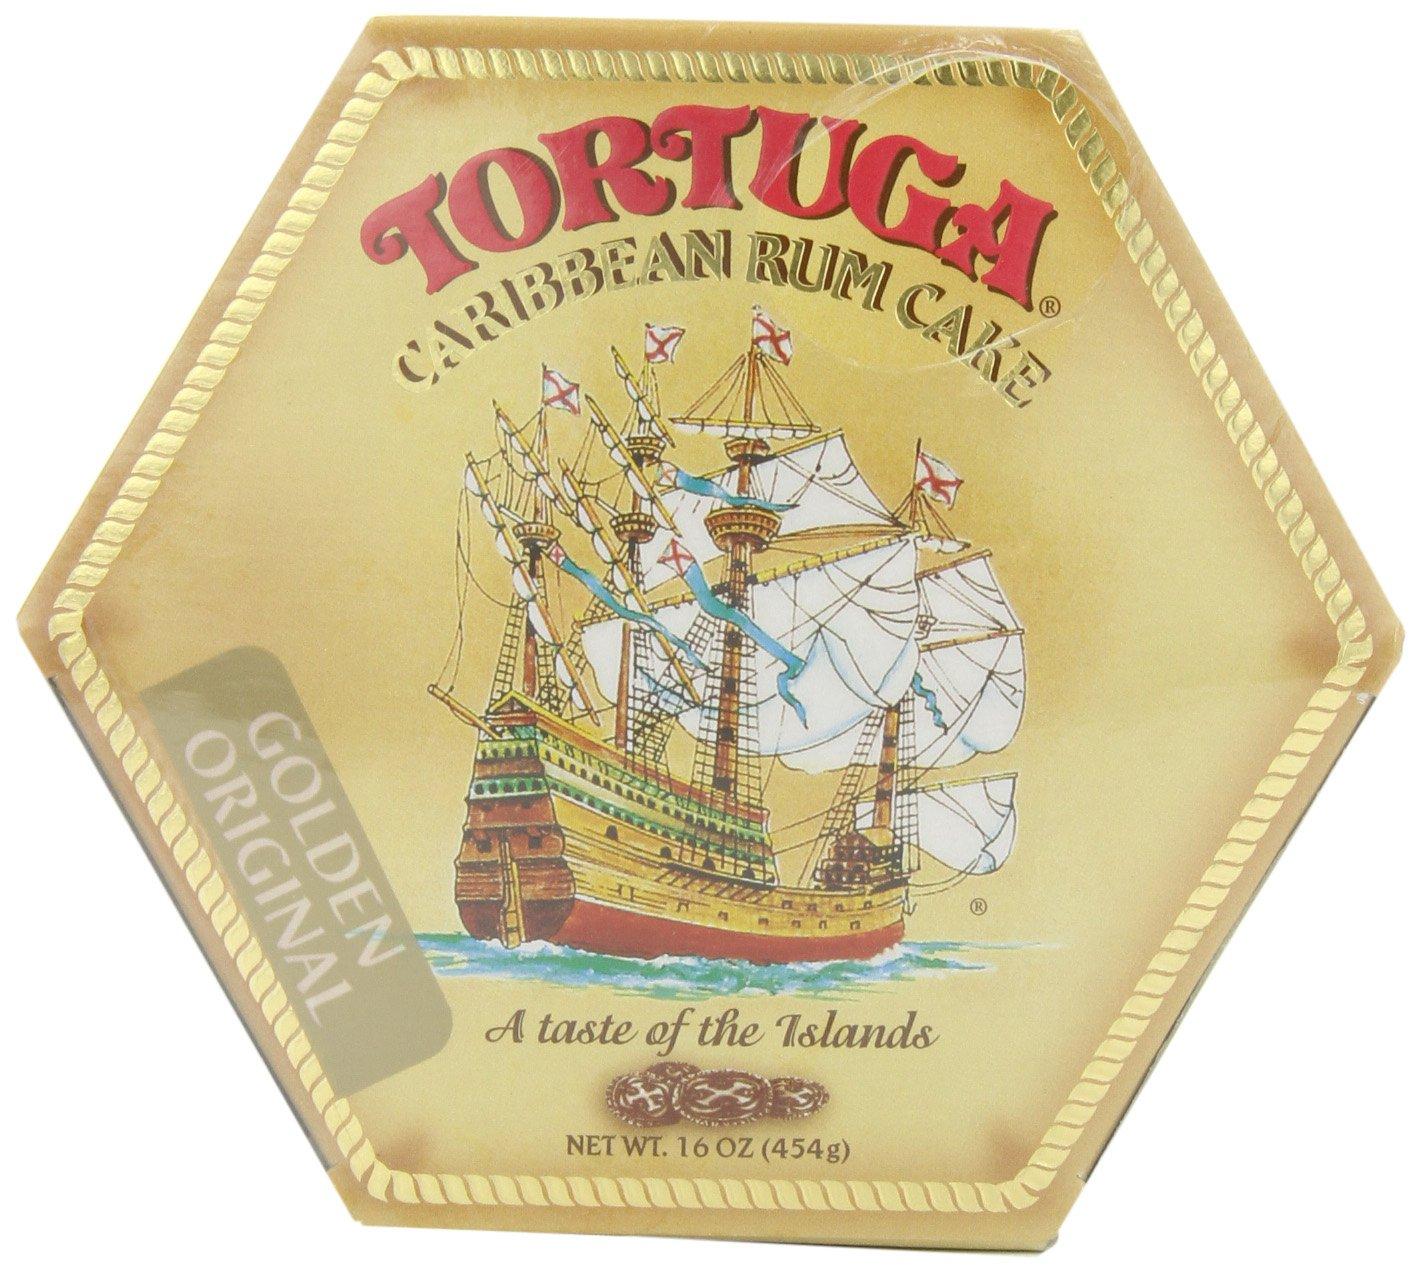 TORTUGA Caribbean Original Rum Cake with Walnuts – 16 oz. - The Perfect Premium Gourmet Gift by TORTUGA (Image #1)